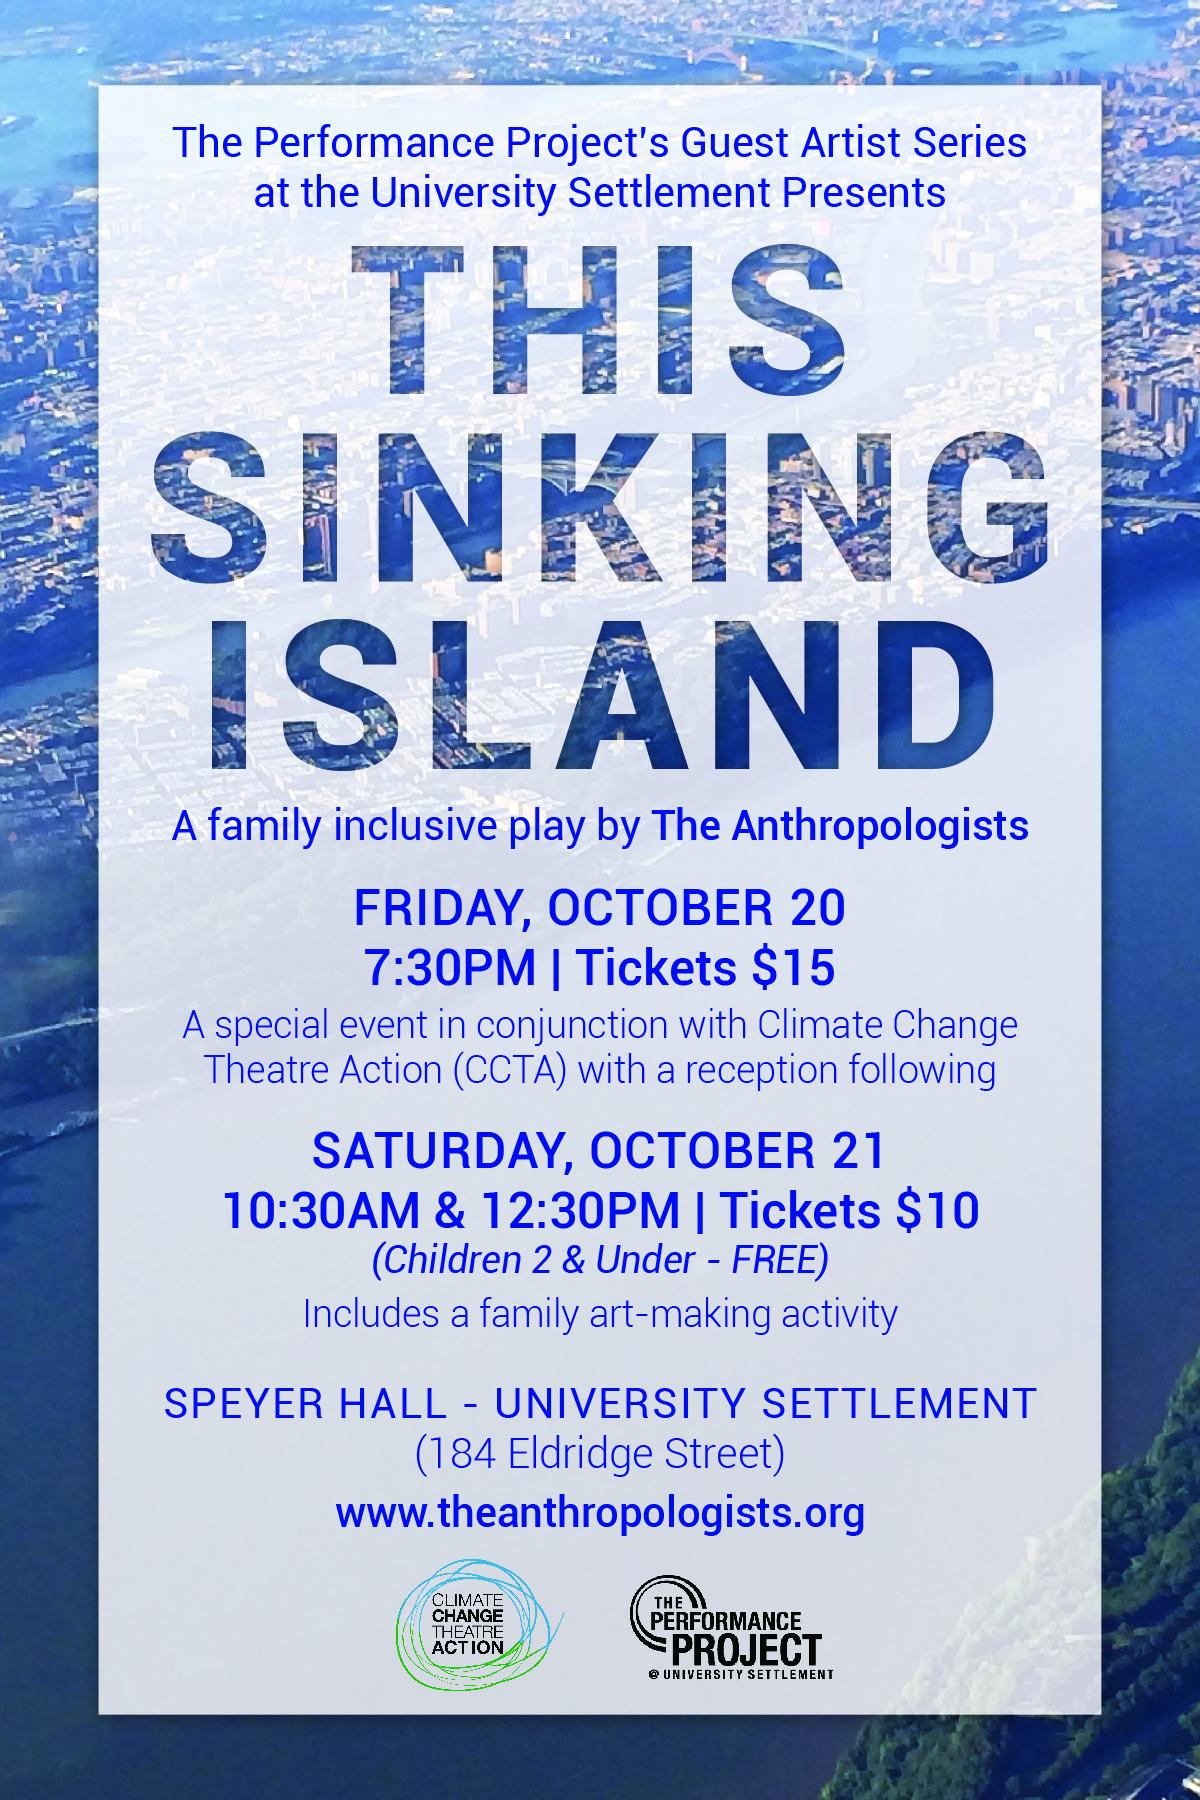 Sinking_Island_pcard_final.jpg